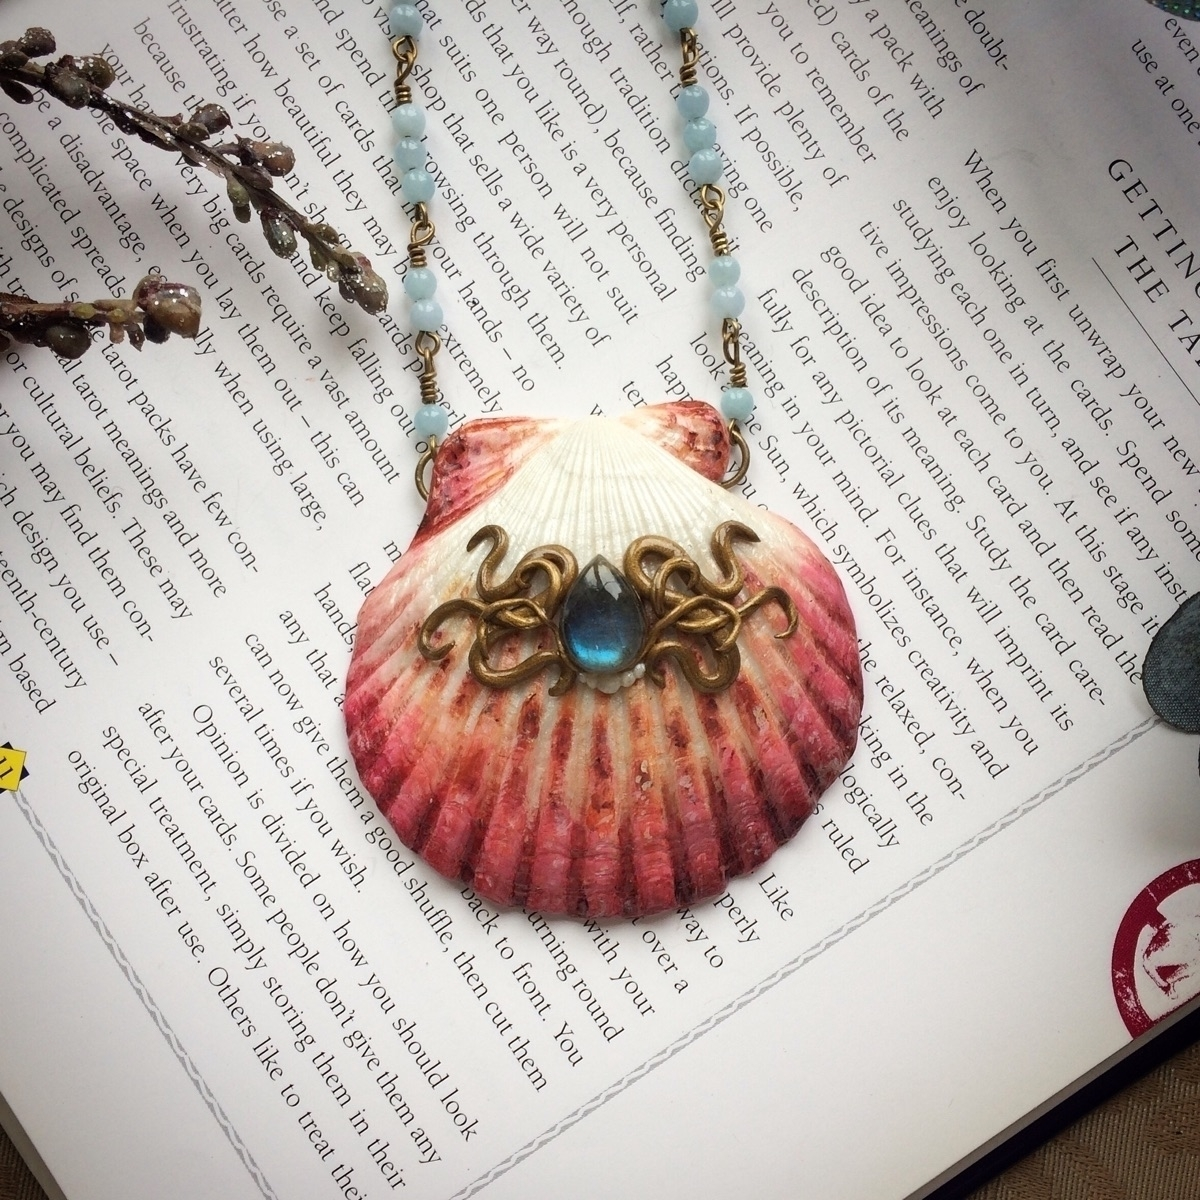 Pretty pink shell teardrop labr - amilliadesigns | ello